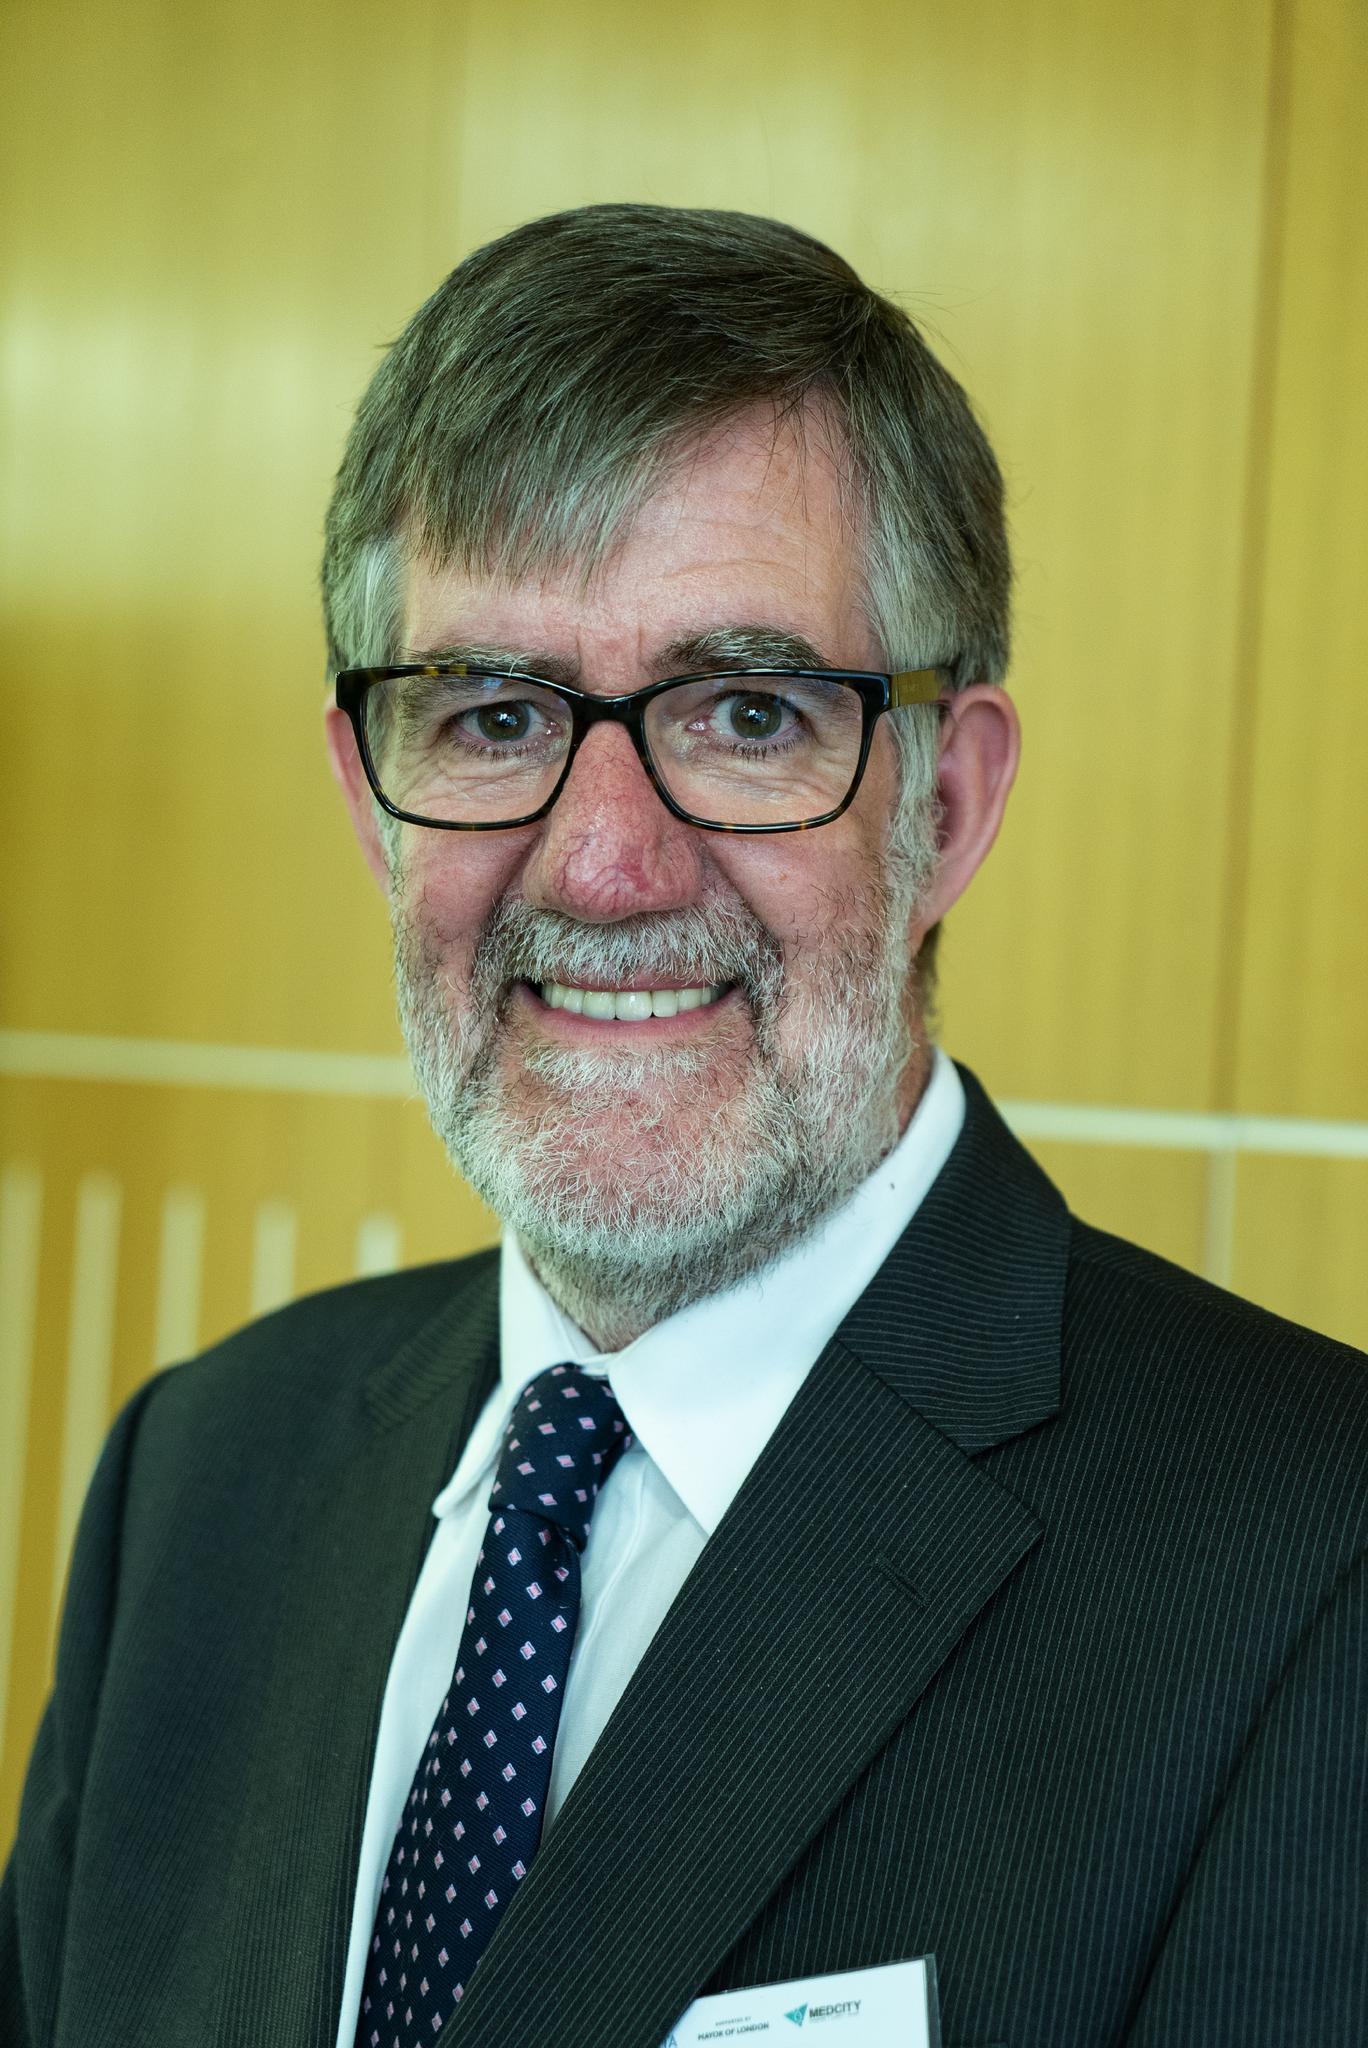 David Parry